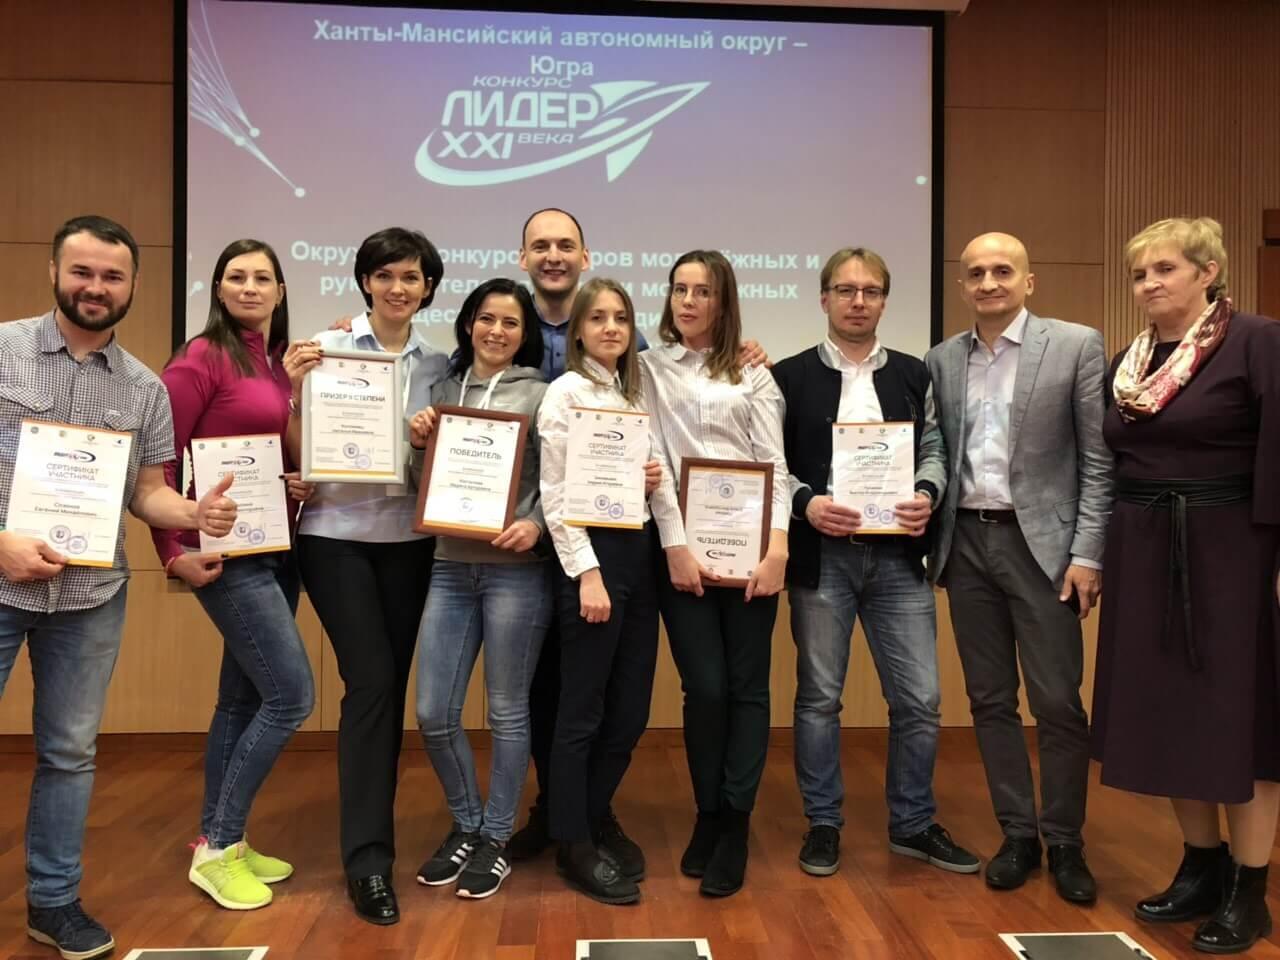 Победители и призеры Югорска на конкурсе «Лидер XXI» века в Ханты-Мансийске